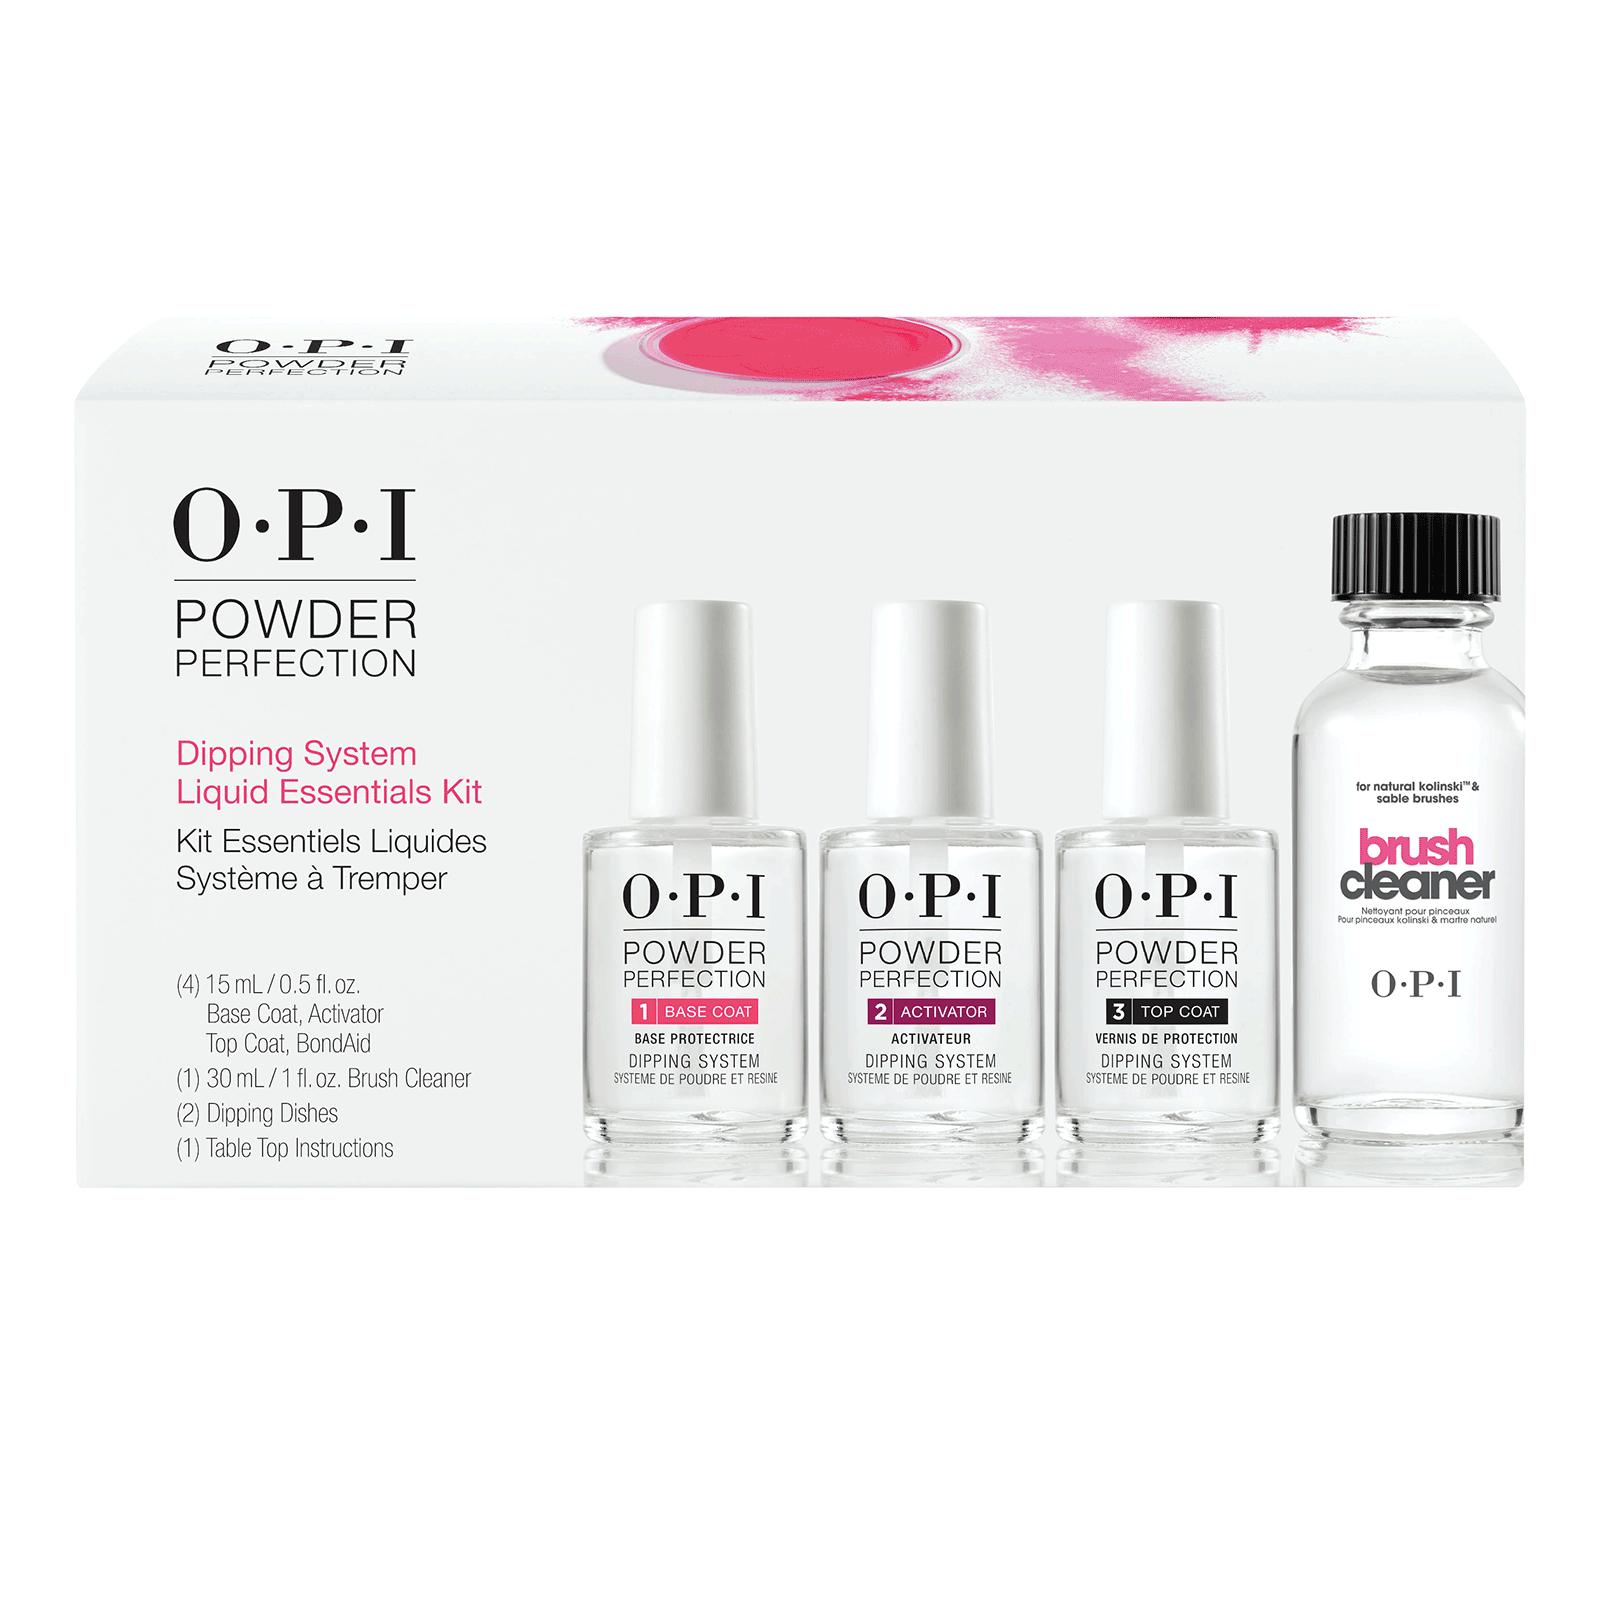 Opi Powder Nail Polish Kit: Powder Perfection Liquid Essentials Kit (California Only